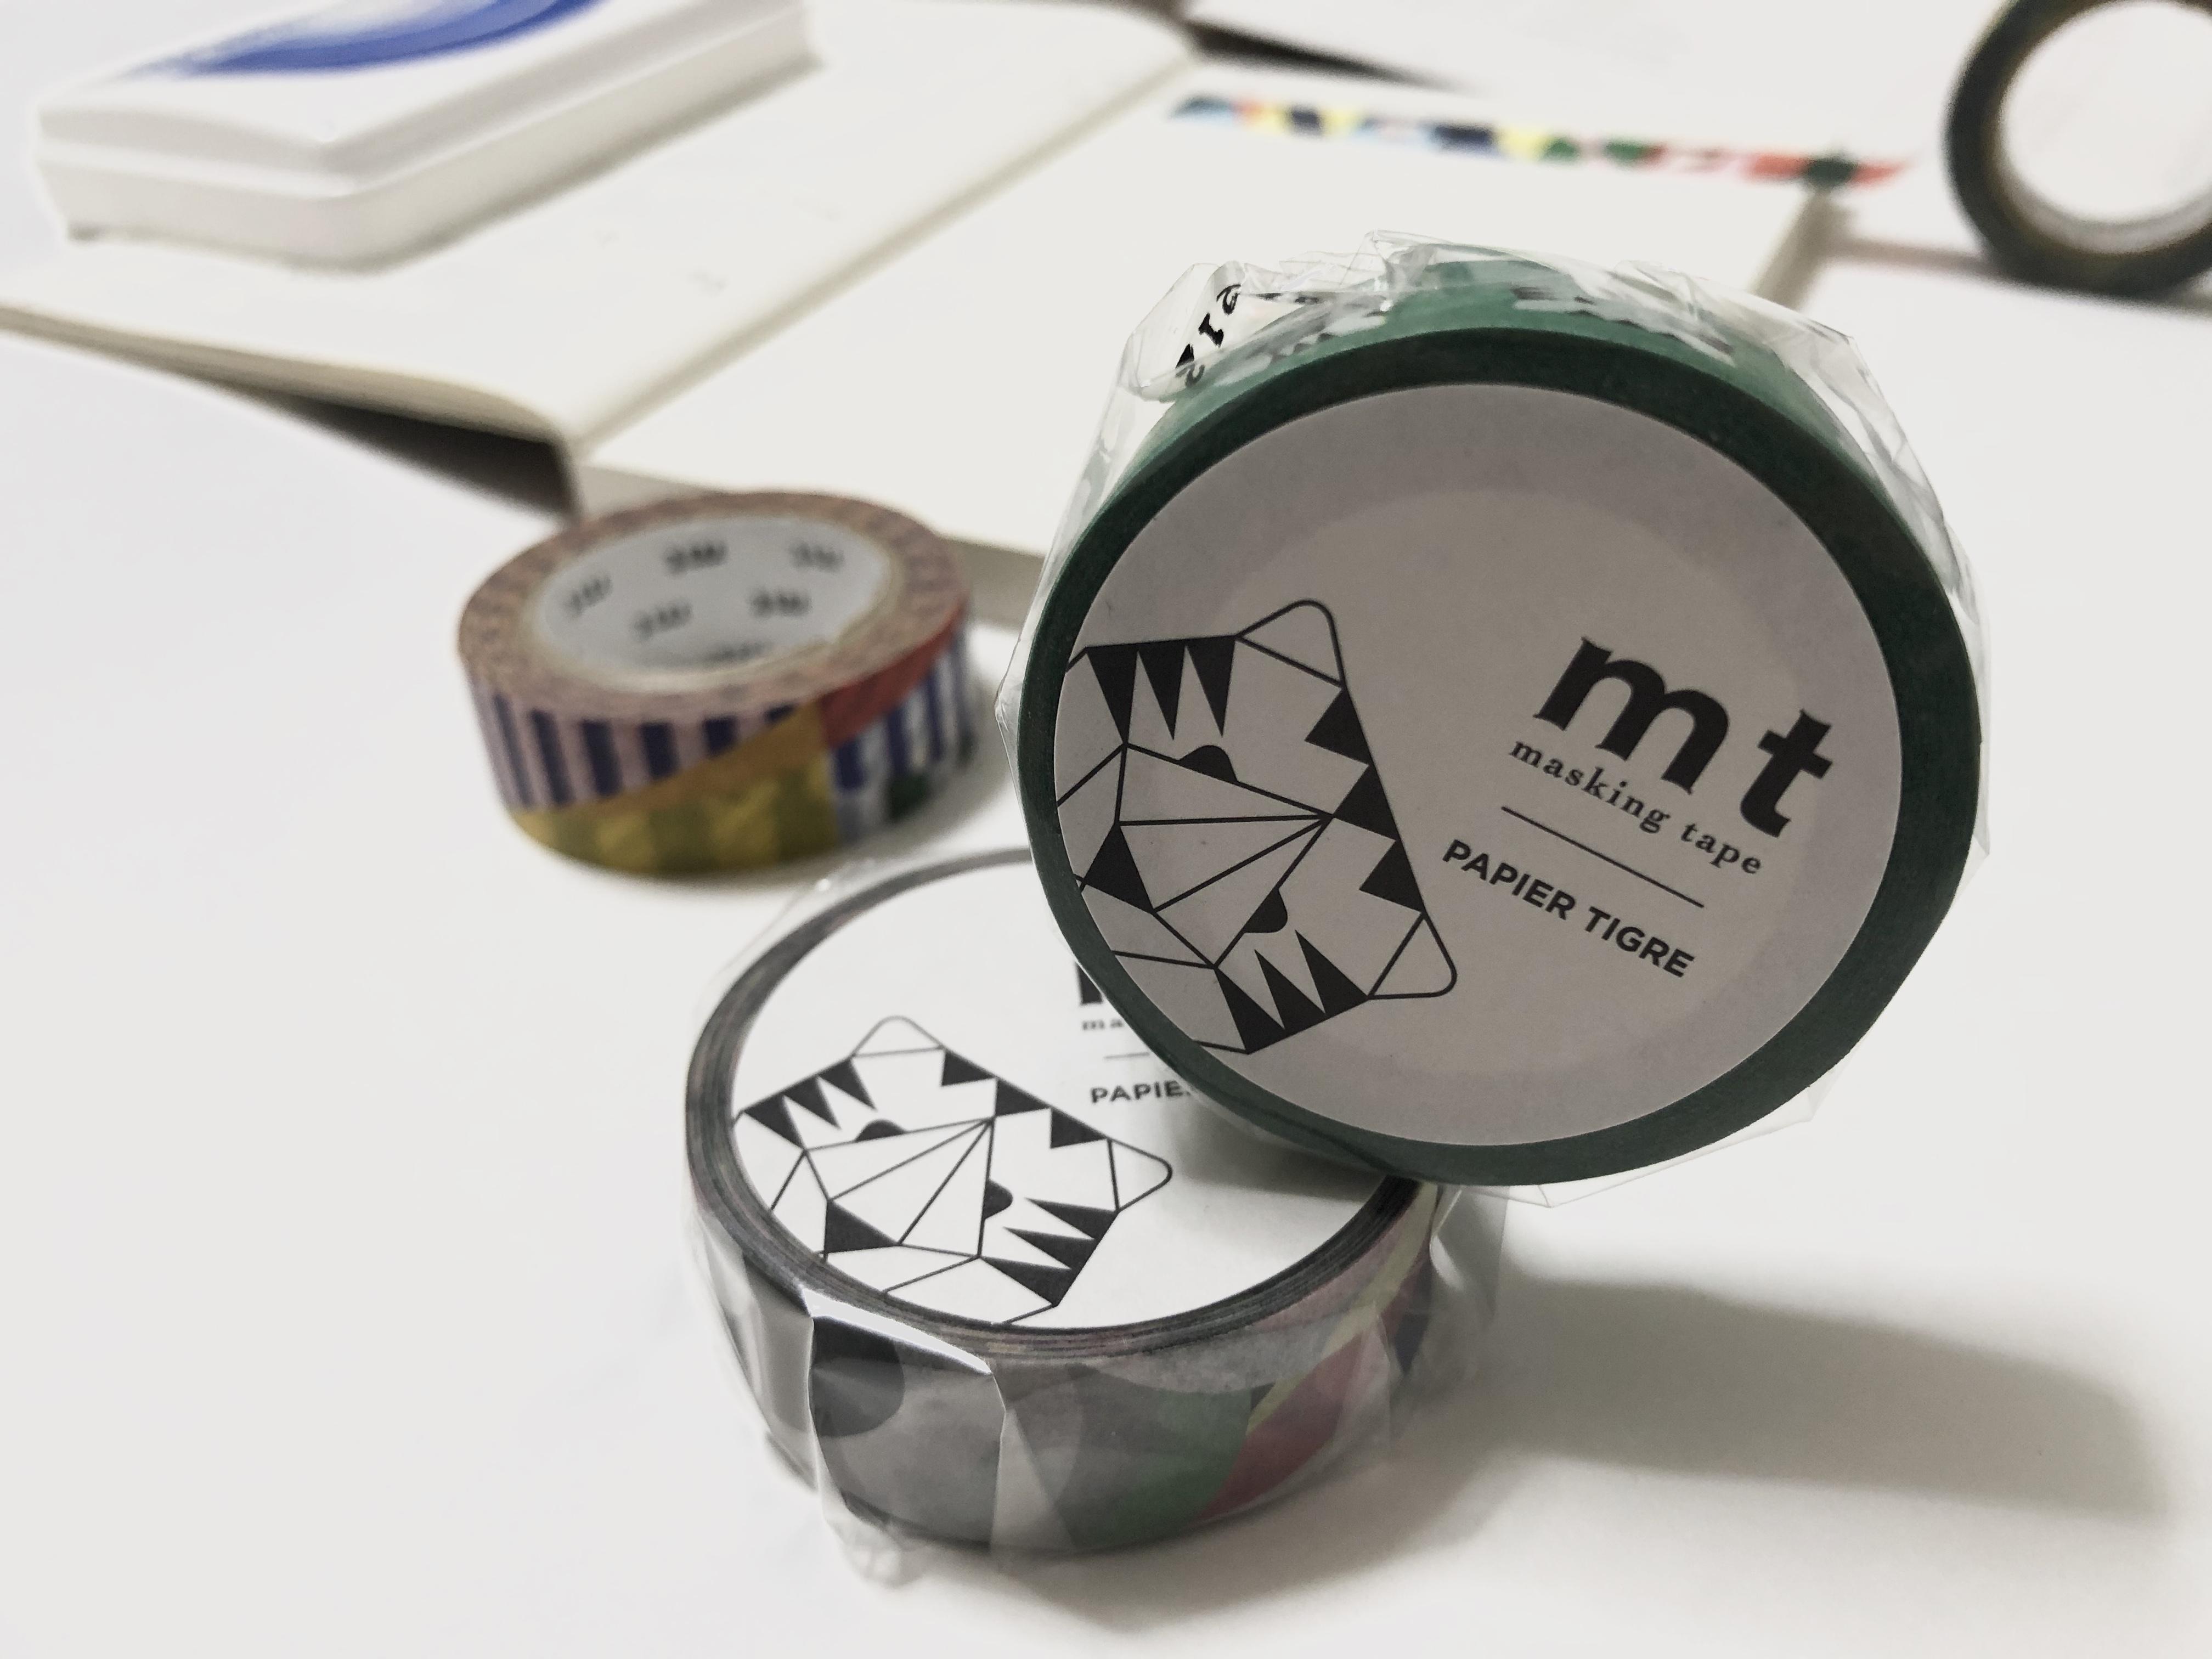 mt × PAPIER TIGREシリーズ